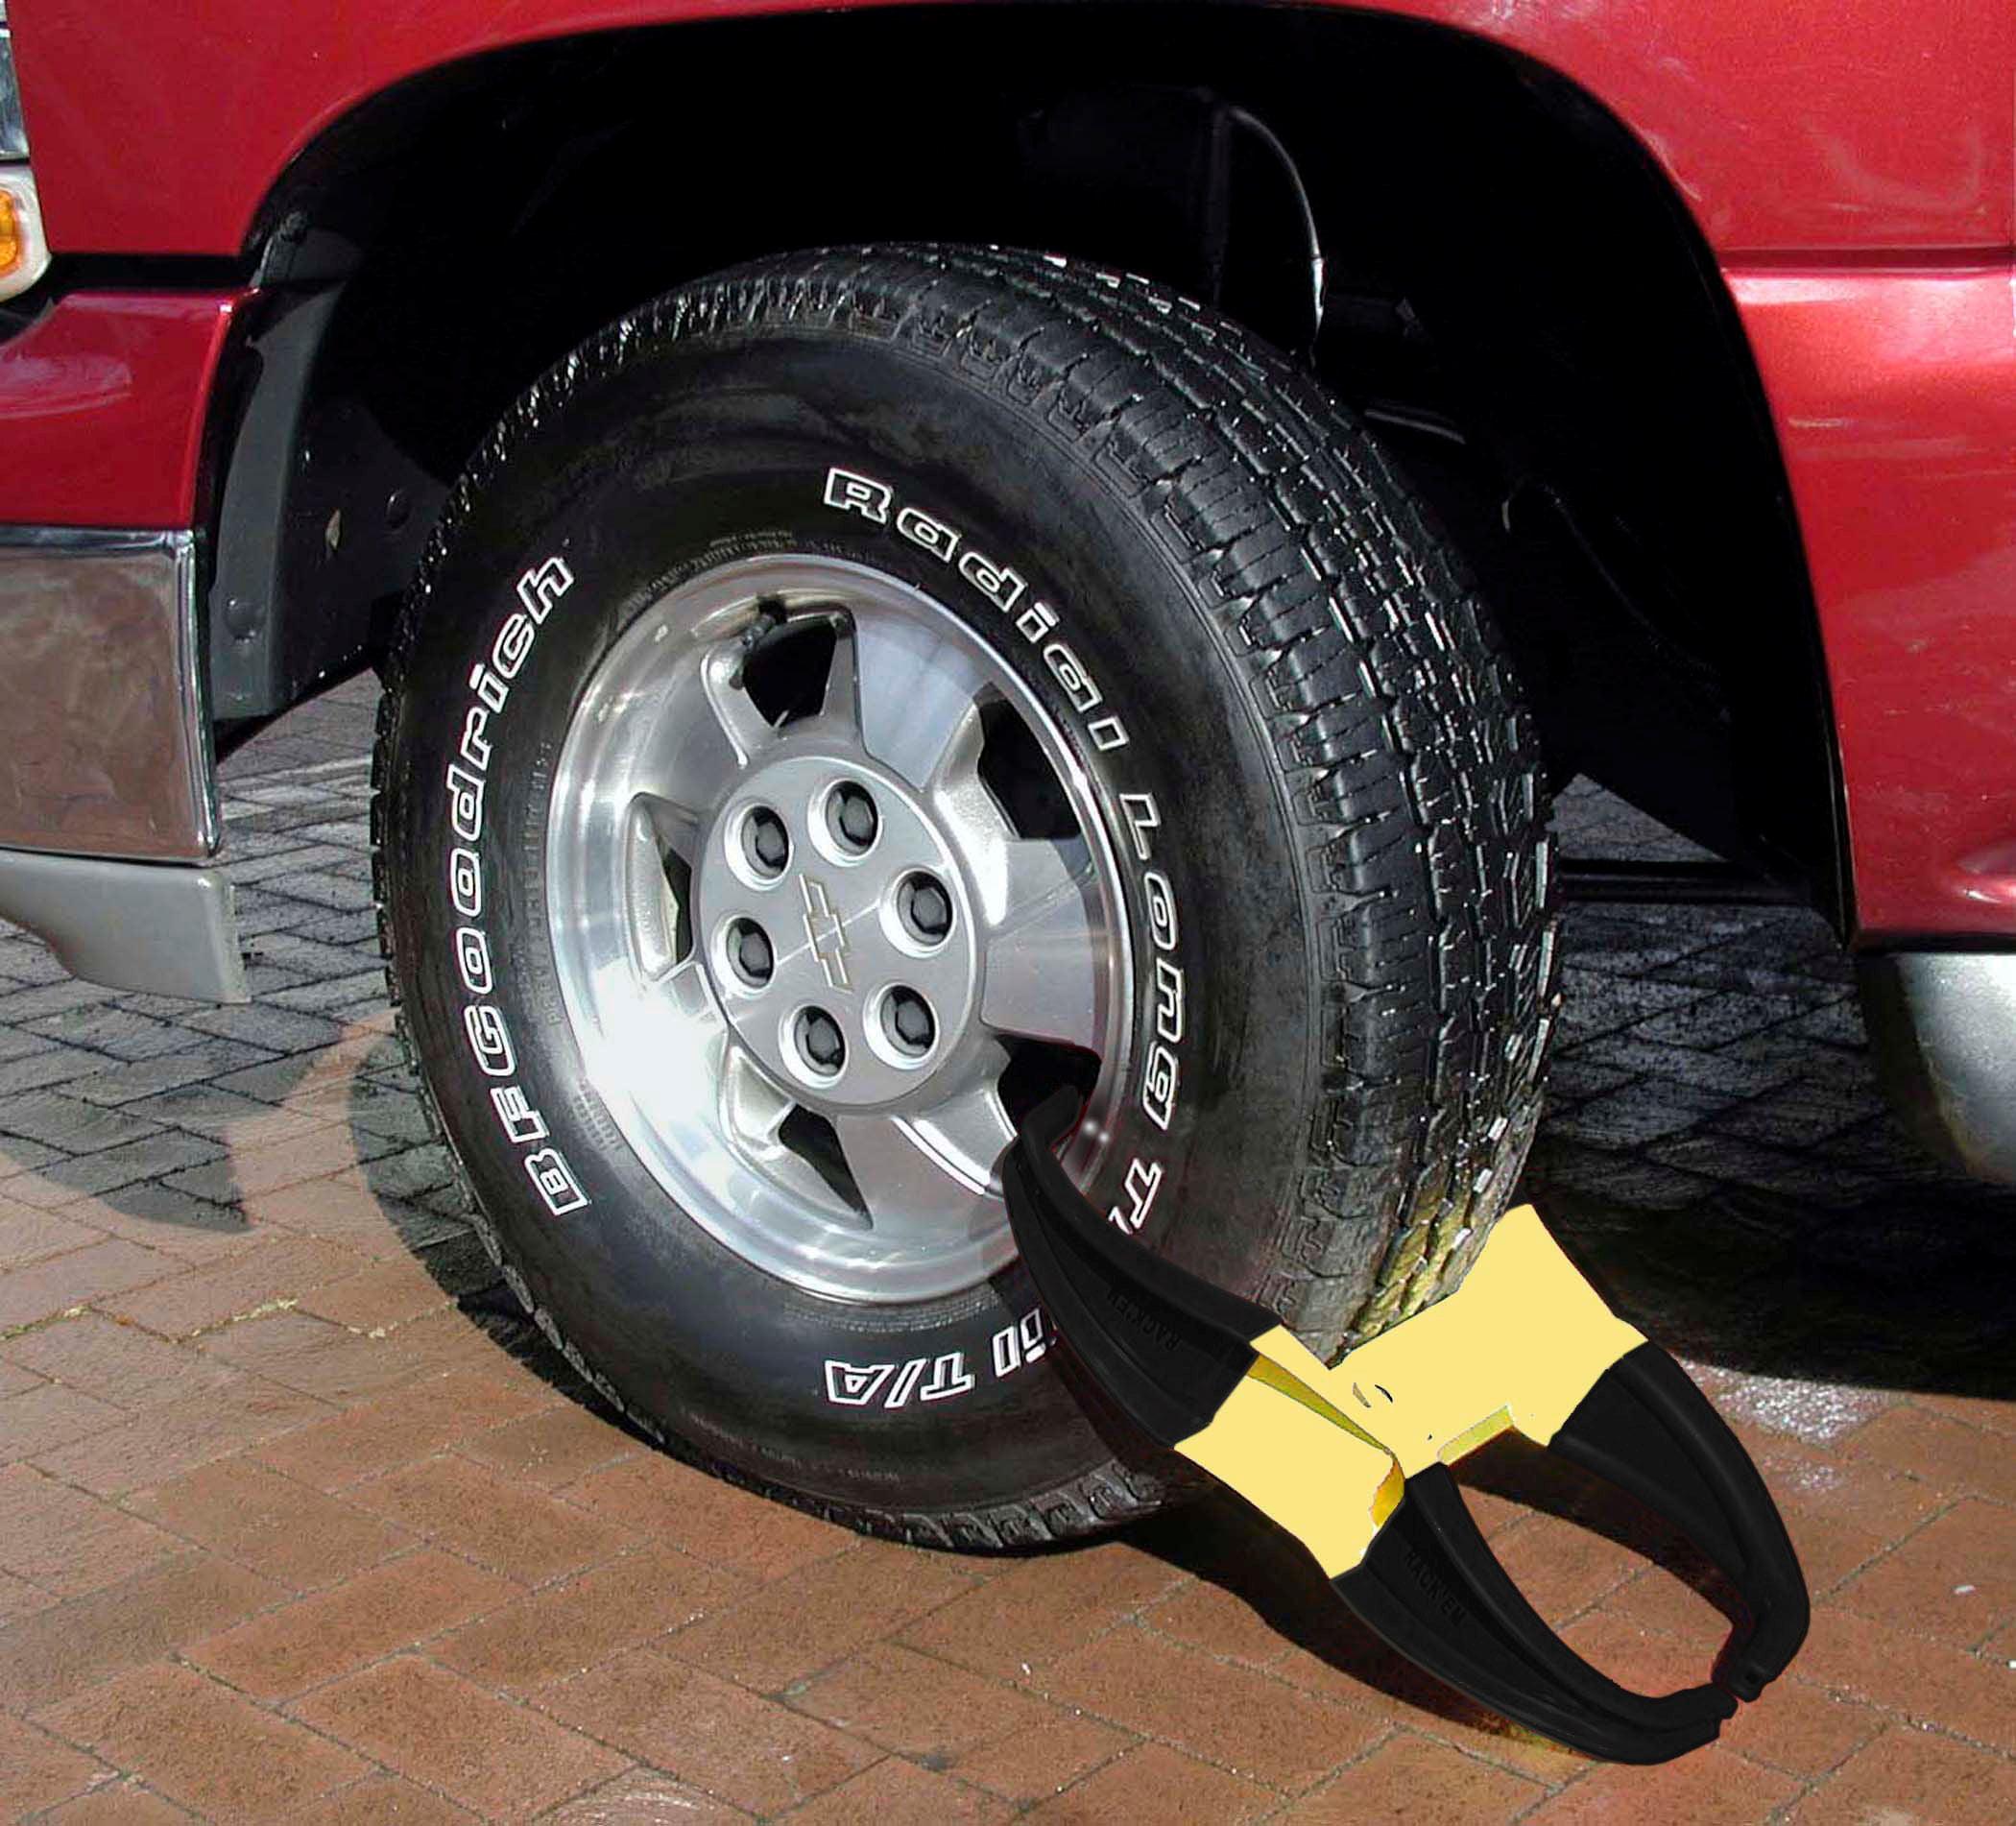 keyed Alike Rack Em Magnum Expandable Wheel Lock RA-25K